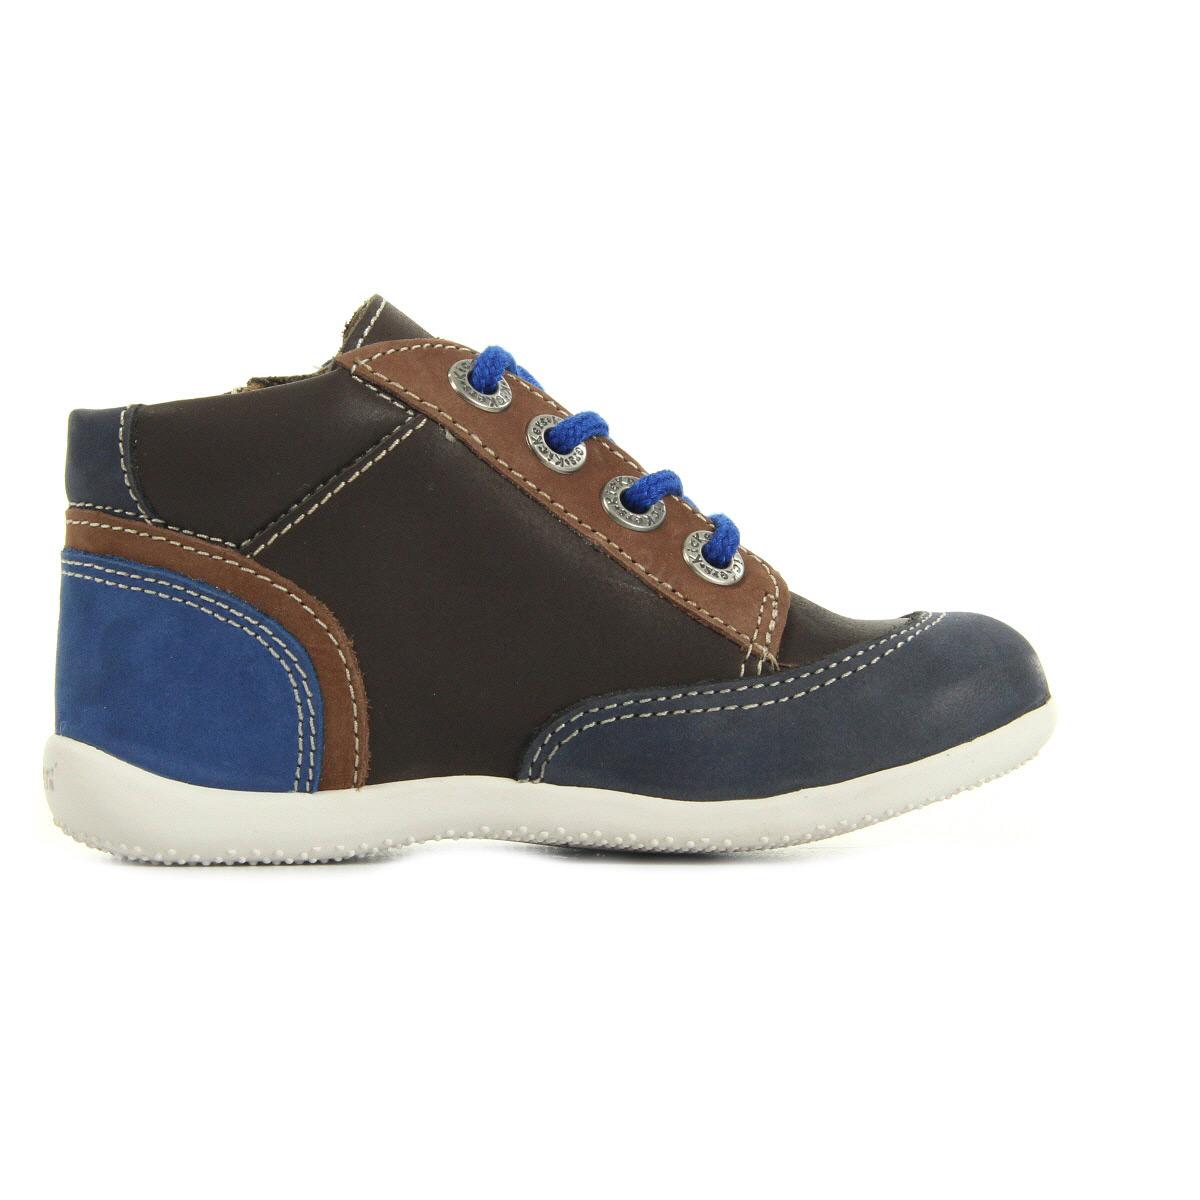 kickers barney marron camel bleu 5087101093 chaussures homme homme. Black Bedroom Furniture Sets. Home Design Ideas